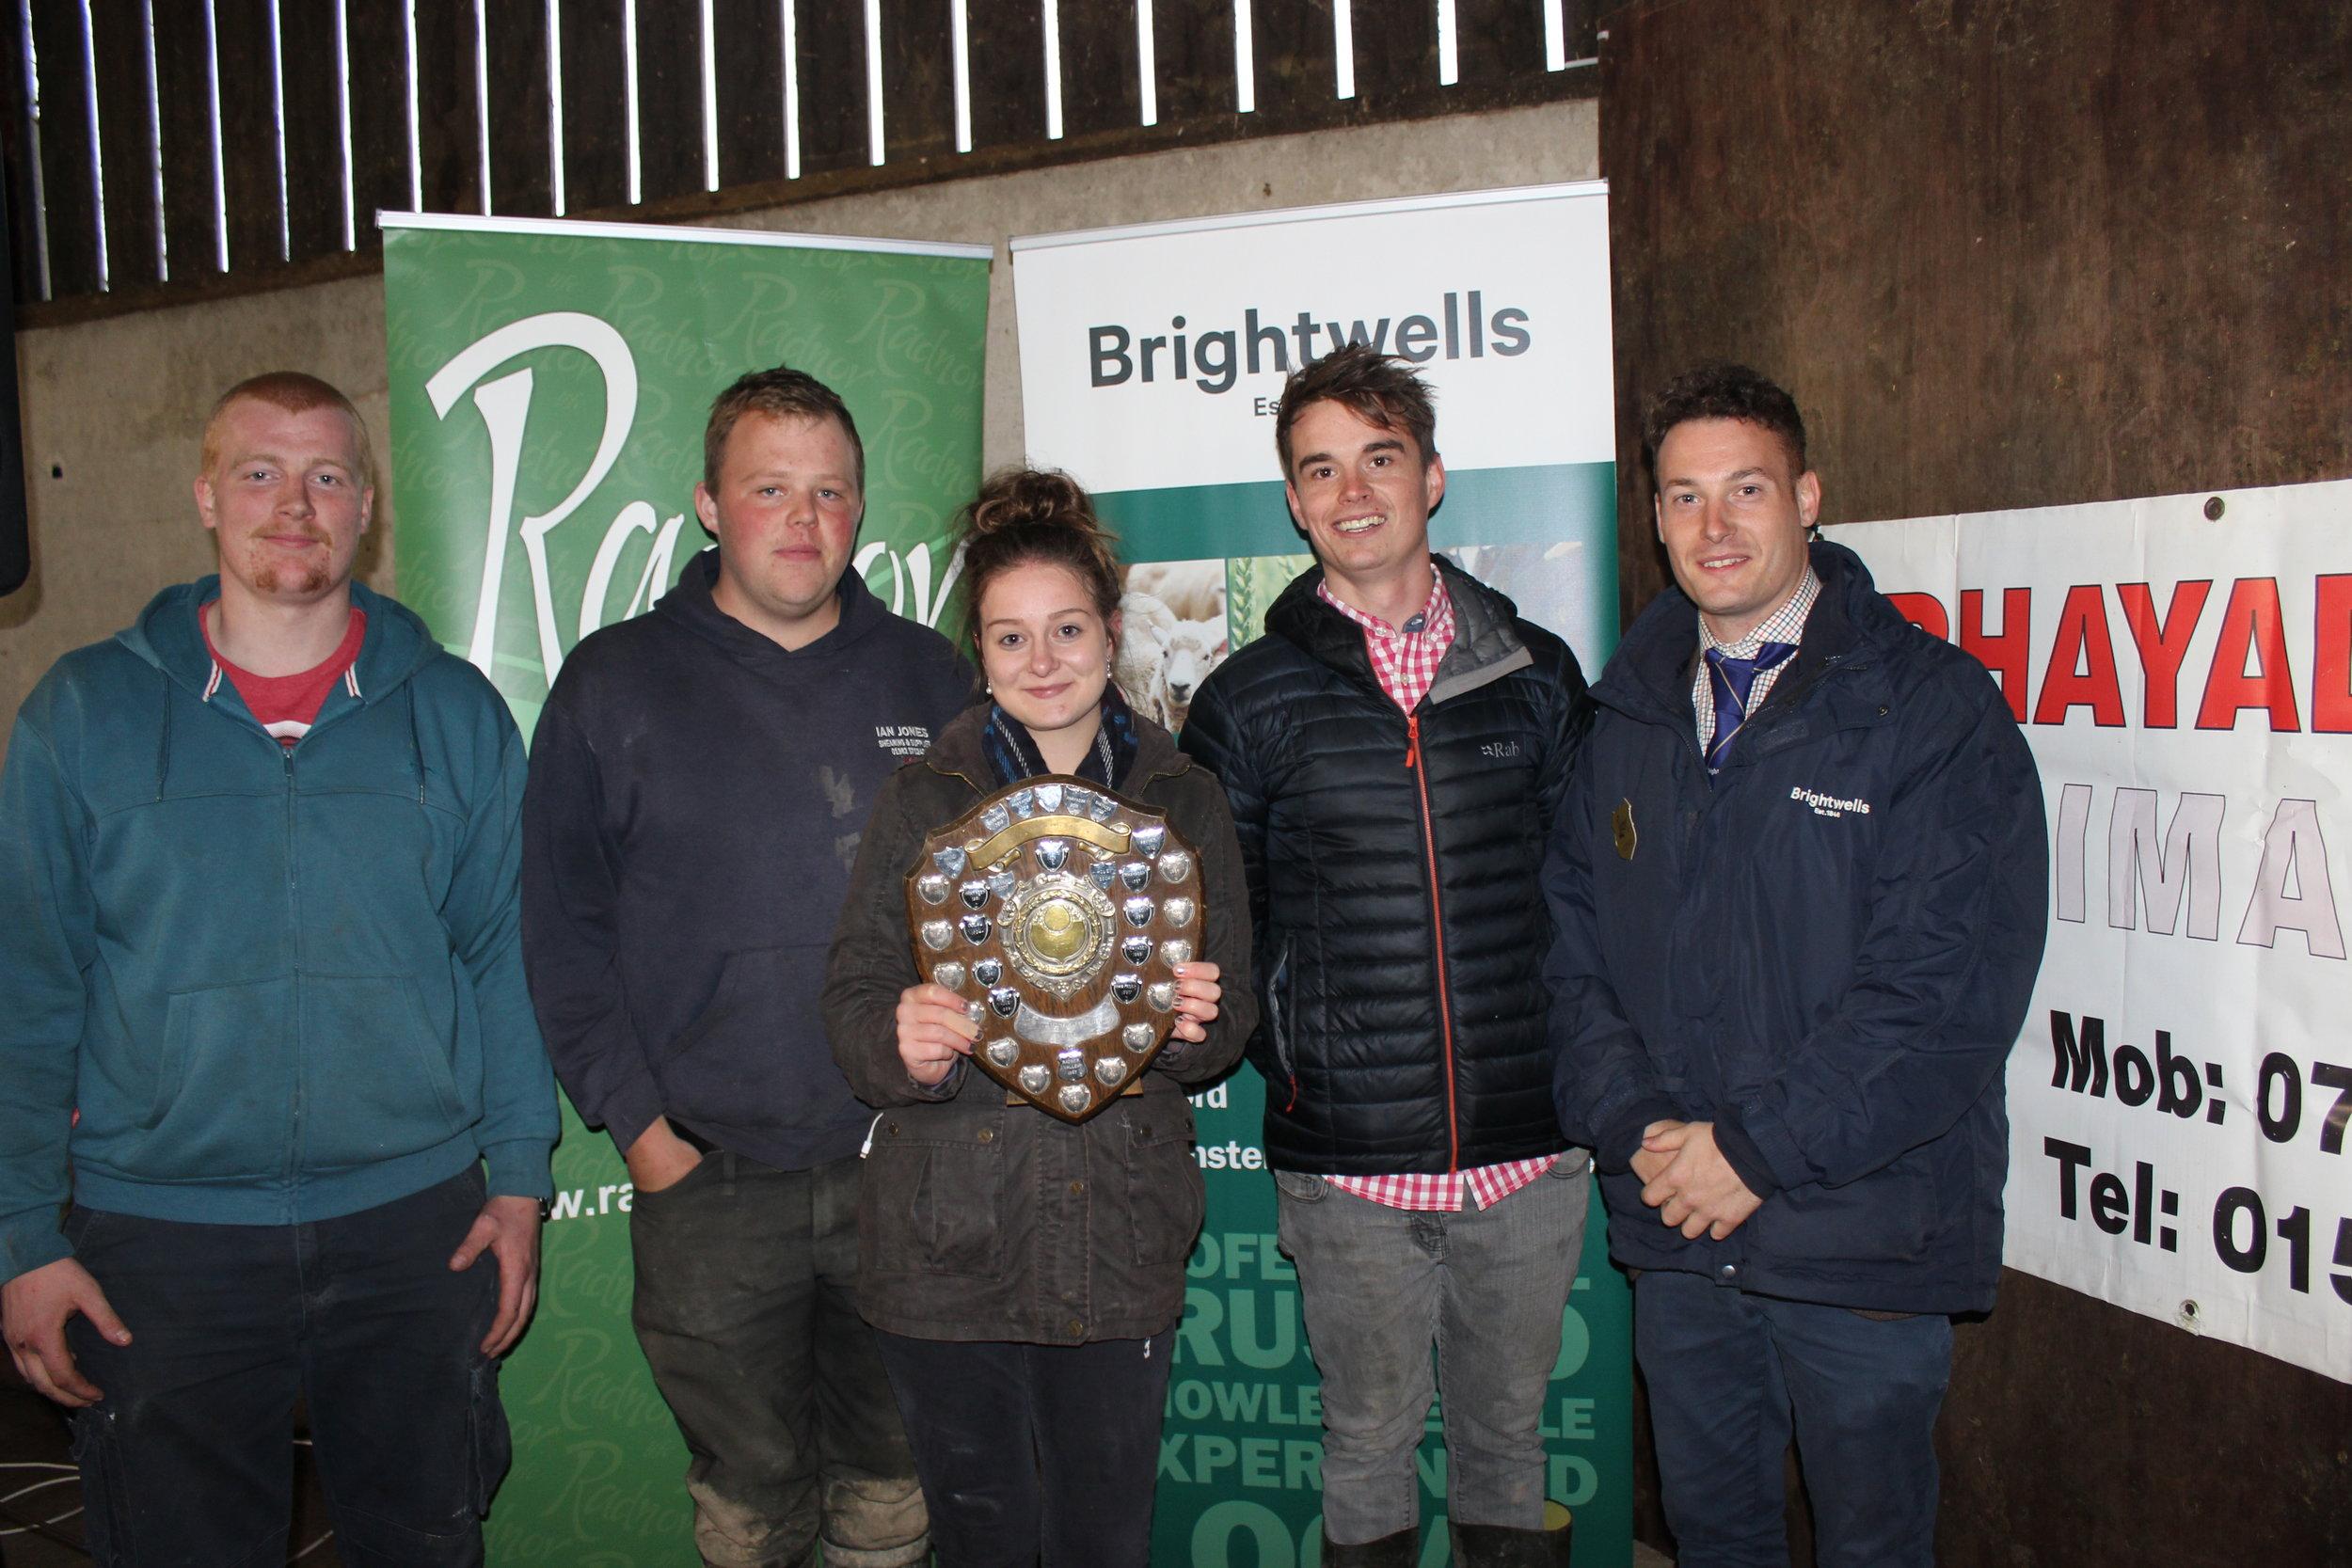 Hugh Price, Sam Bowen, Sally Morris & Edward Hamer, Radnor Valley YFC - Penybont YFC Shield (Farm Safety Skills), being presented by Matt Williams, Brightwells